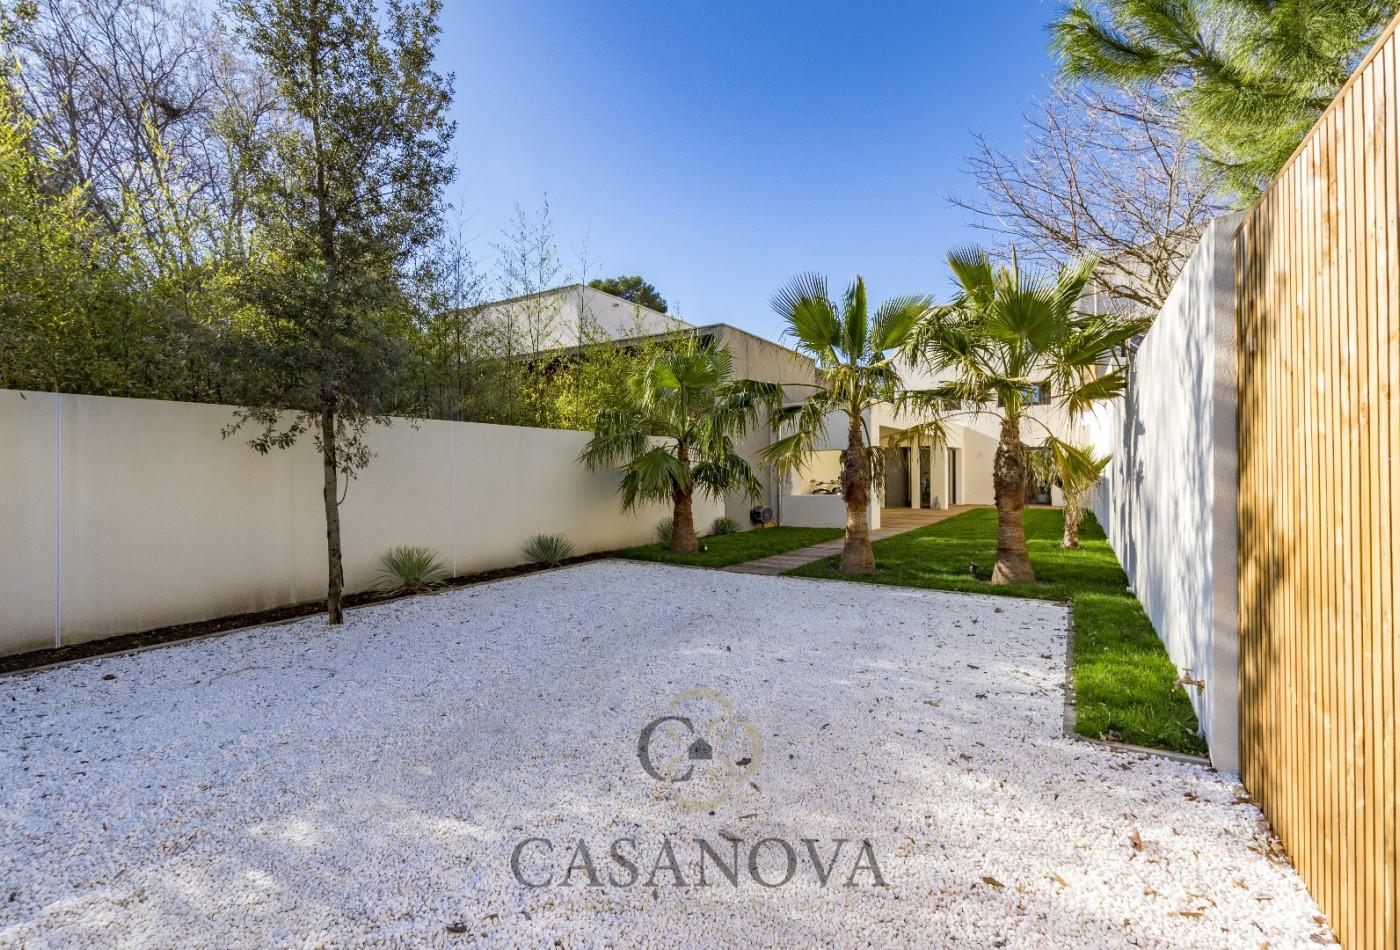 A vendre  Montpellier   Réf 340148496 - Agence galerie casanova